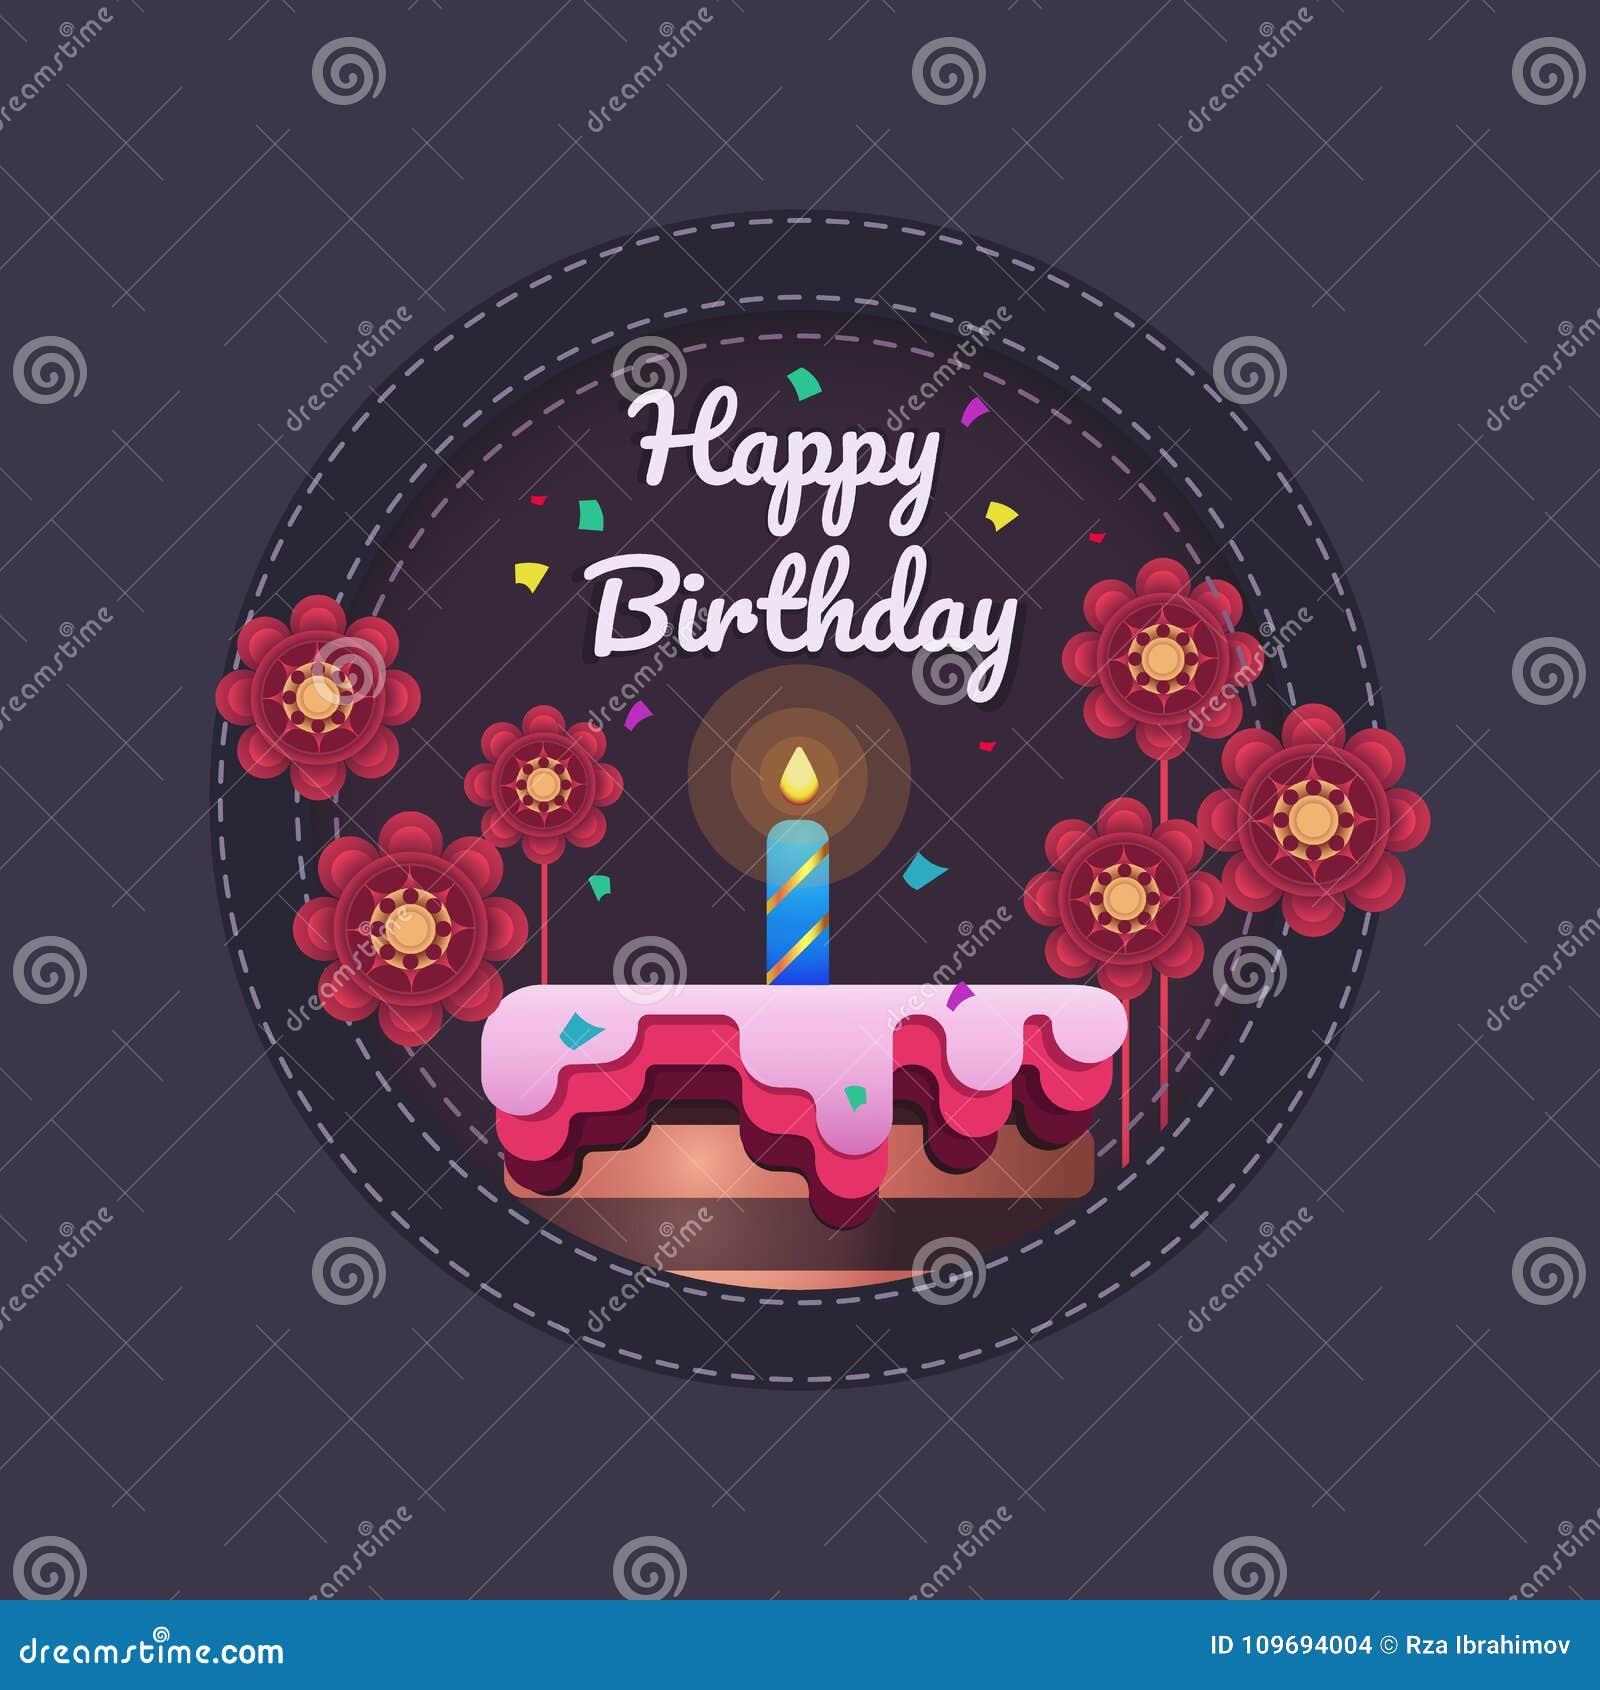 Happy Birthday Greeting Card Template Design Stock Vector